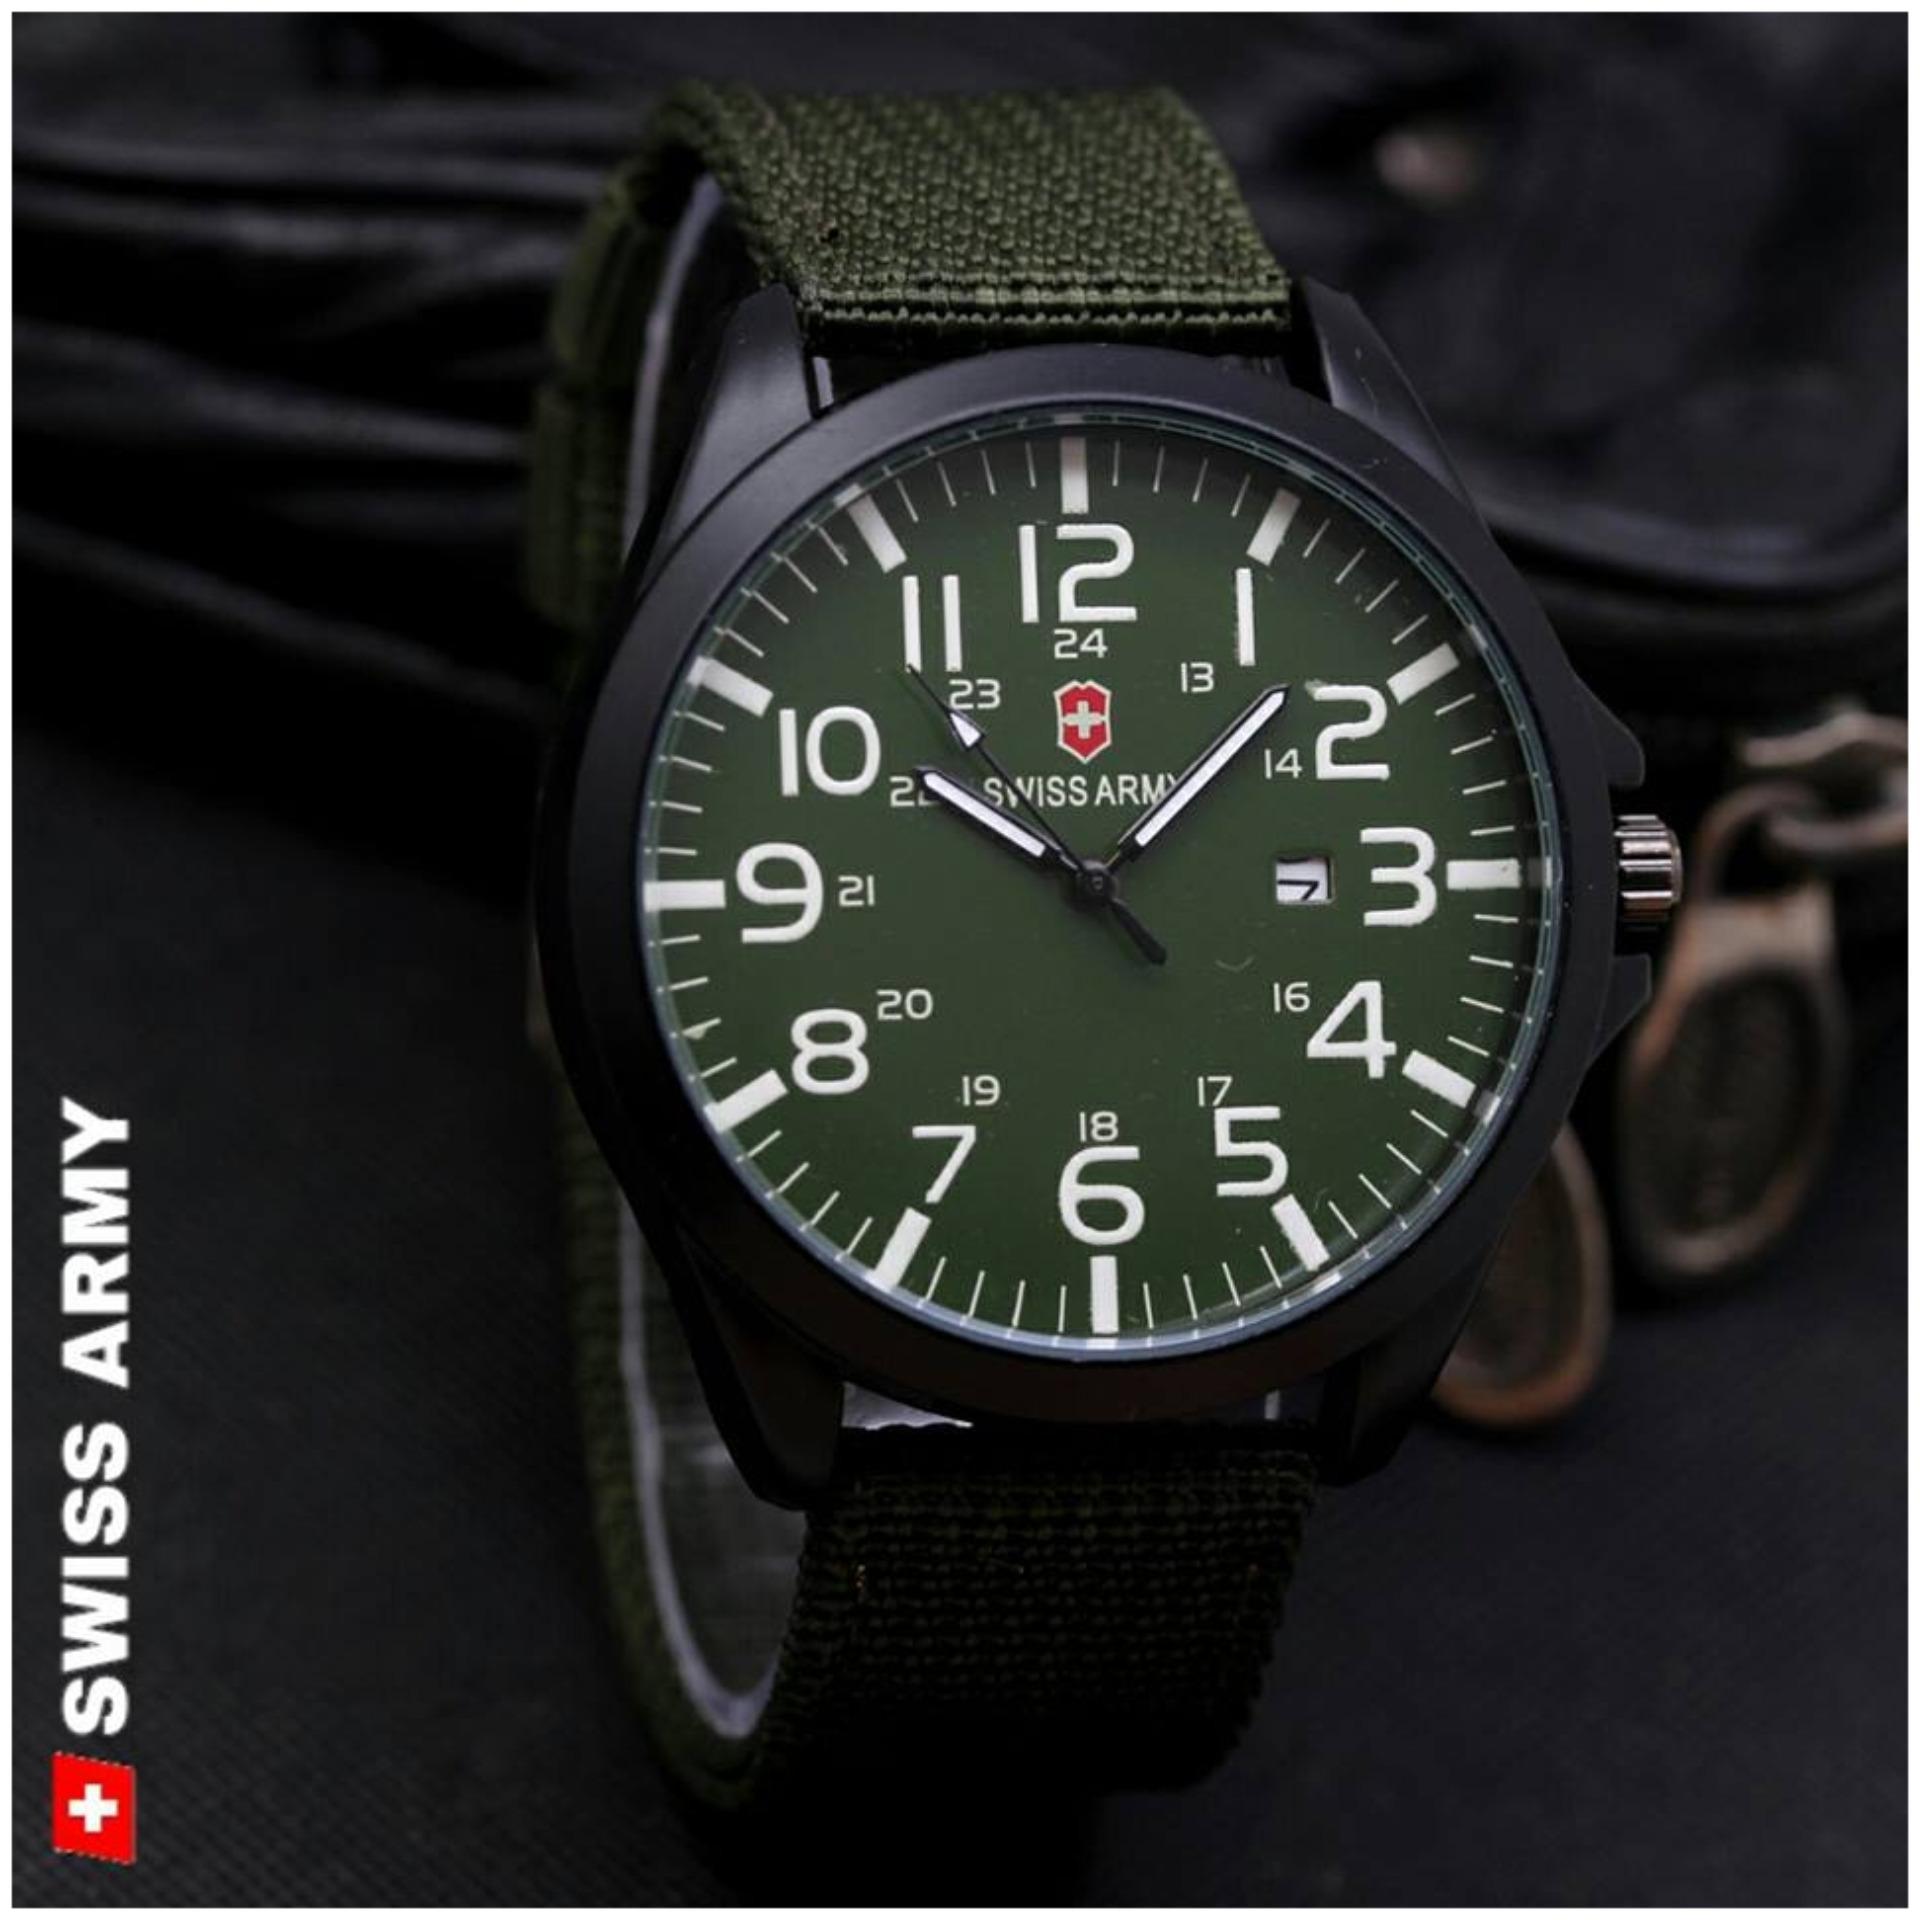 Swiss Army Chrono Jam Tangan Pria Leather Strap Sa1359hm Daftar Balmer Sapphire D46h735bl7910mckts Chronograph Coklat